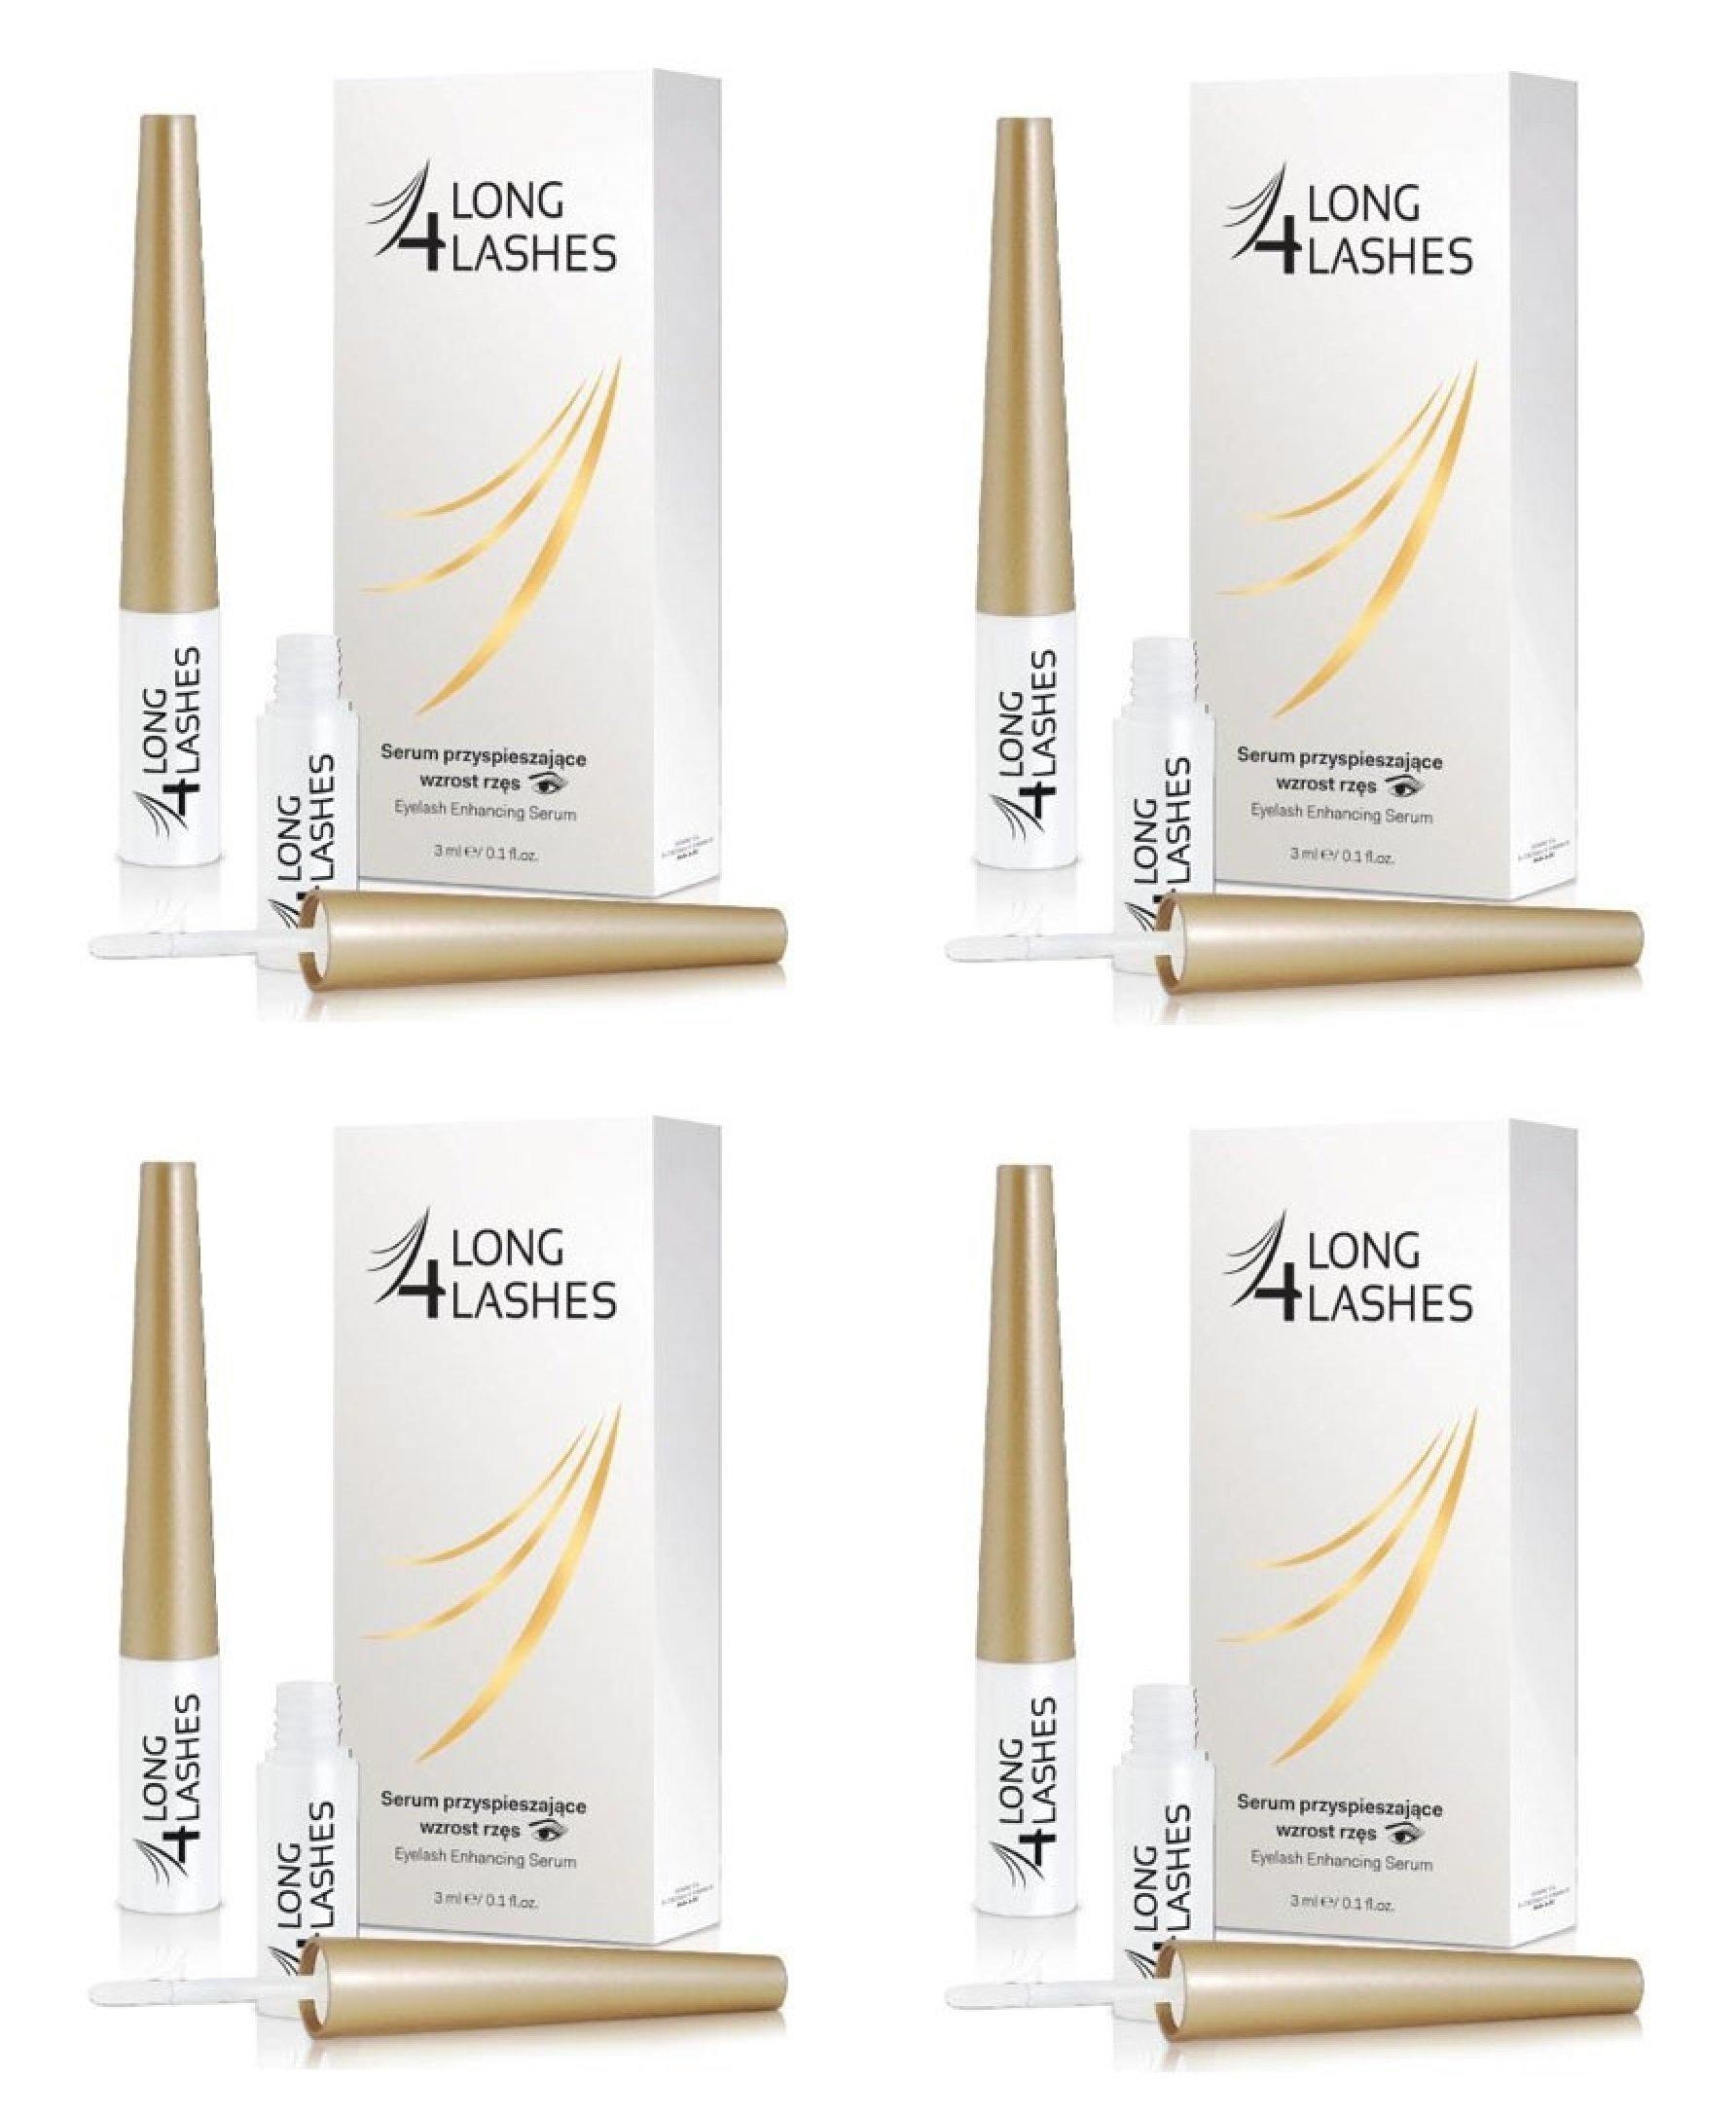 Long 4 Lashes by Oceanic Eyelash Enhancing Serum, 3 ml (Pack of 4)